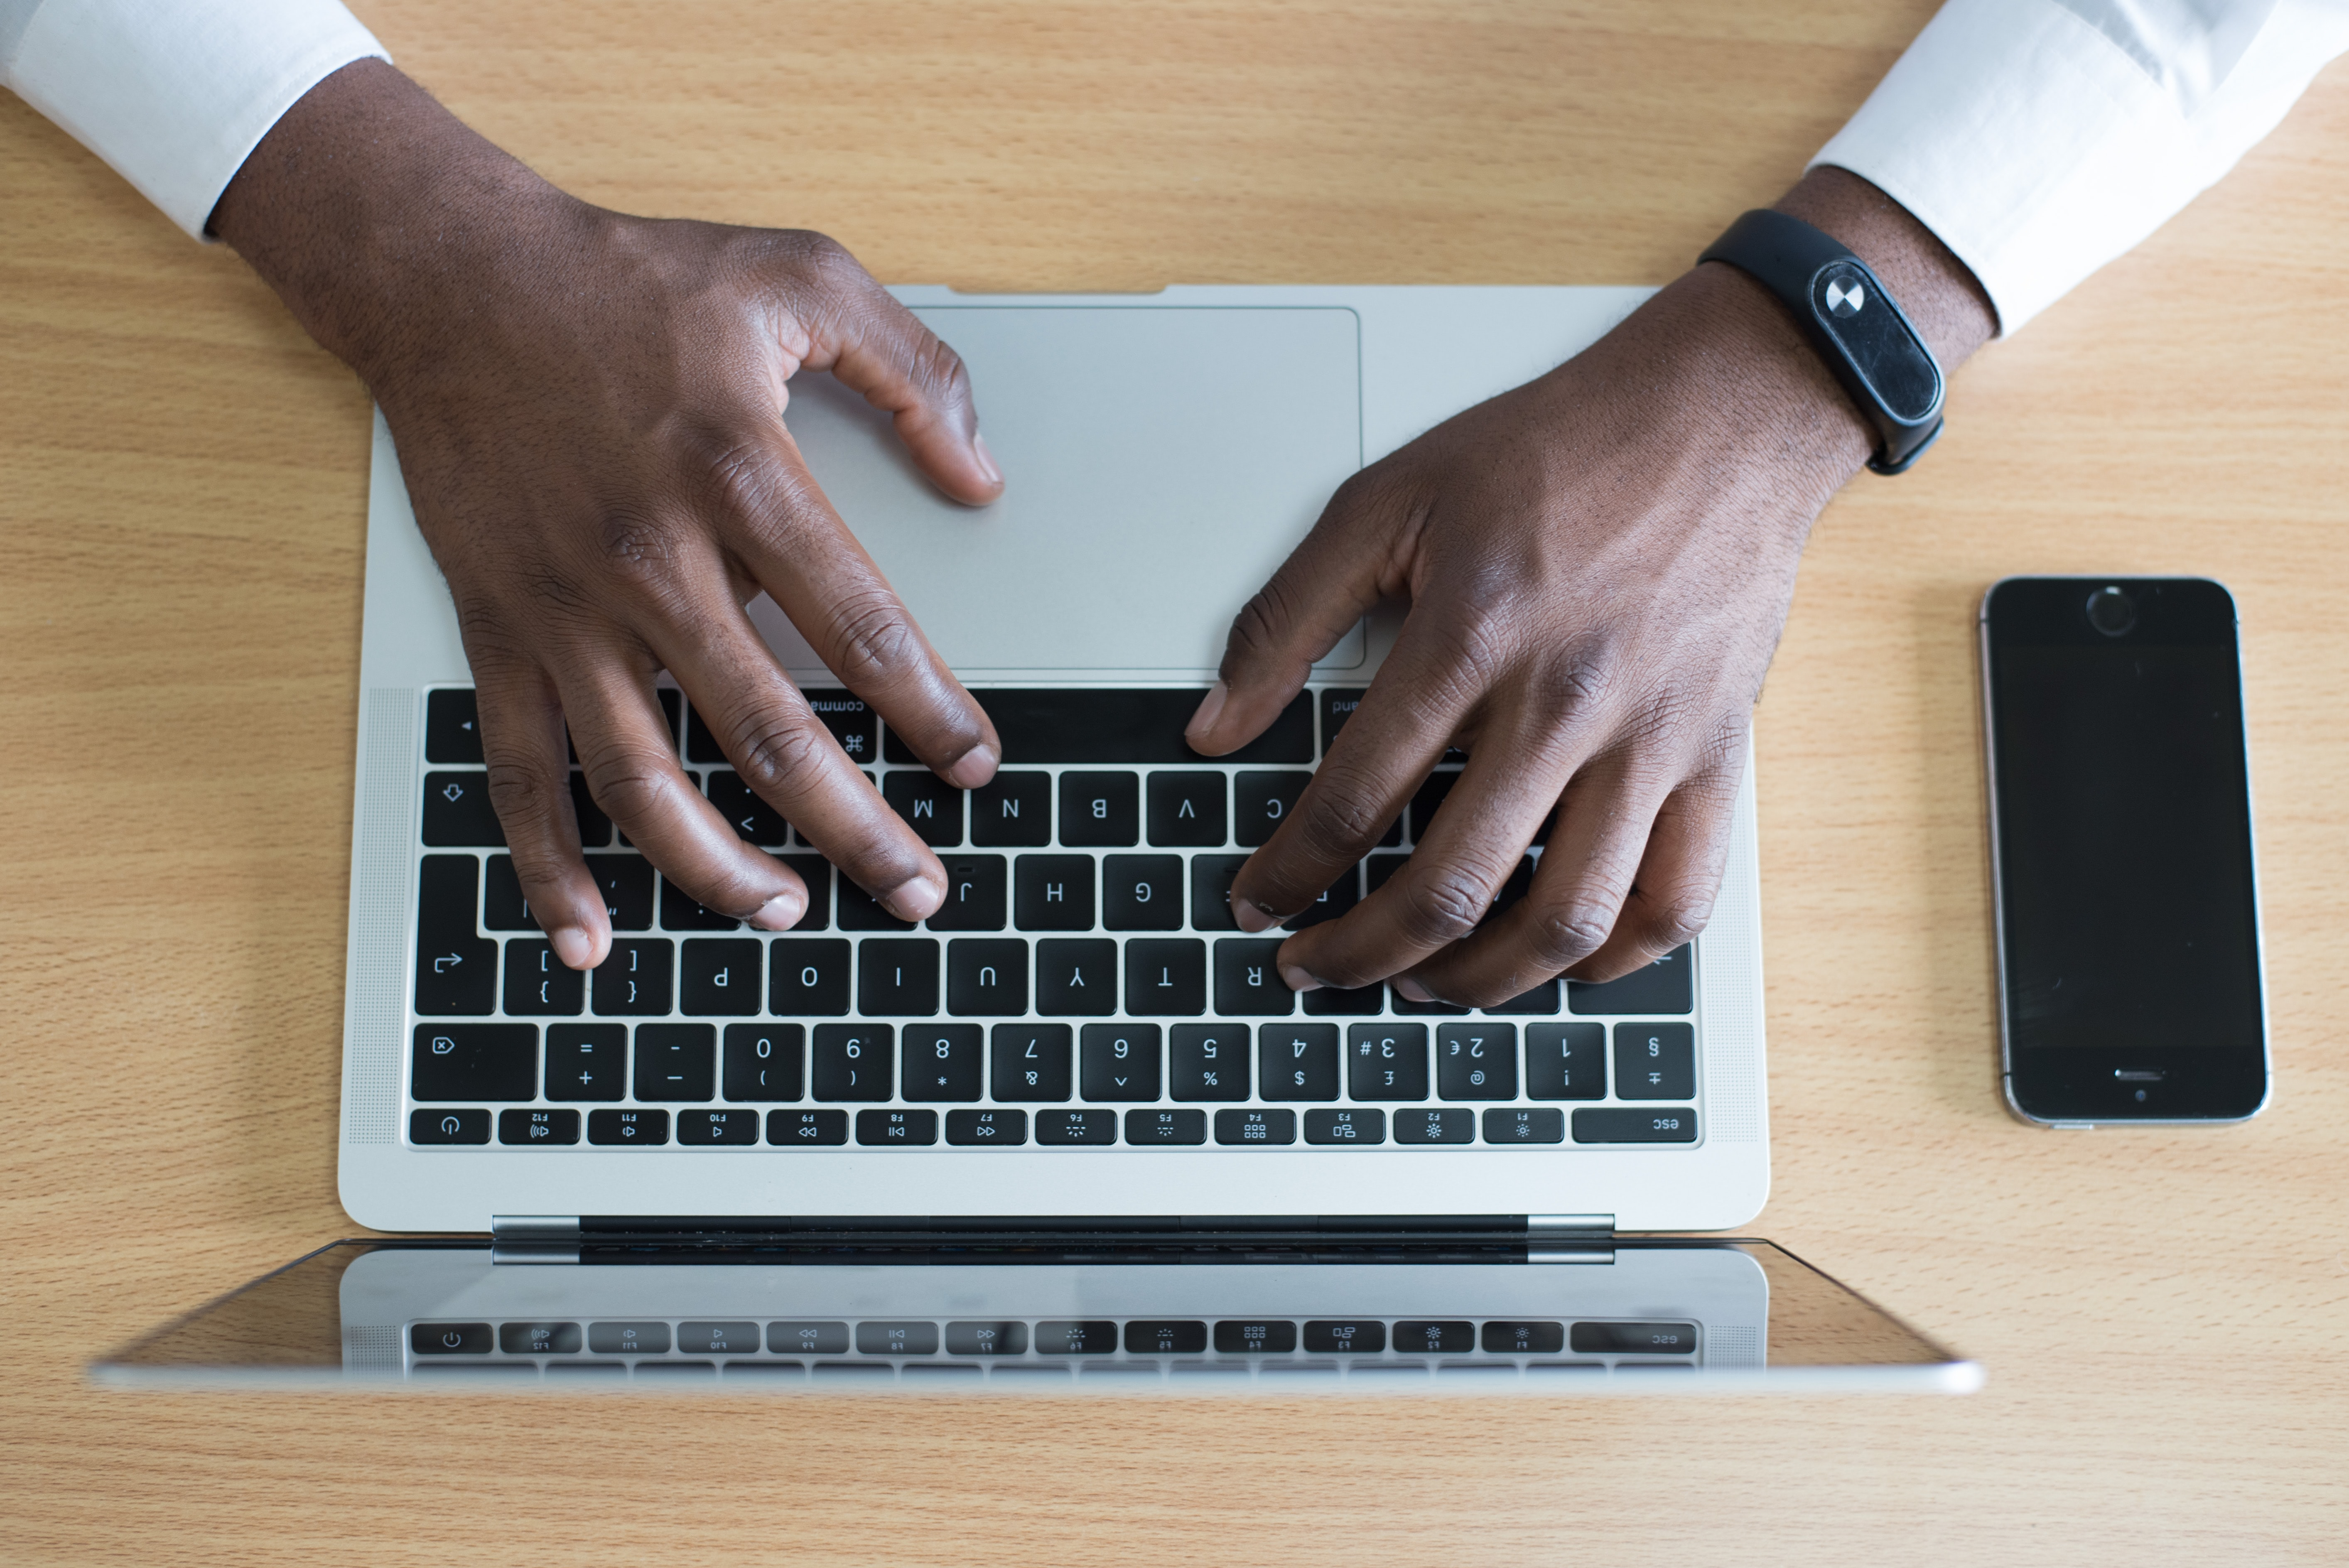 Man's hands on keyboarad making estate plan on computer.